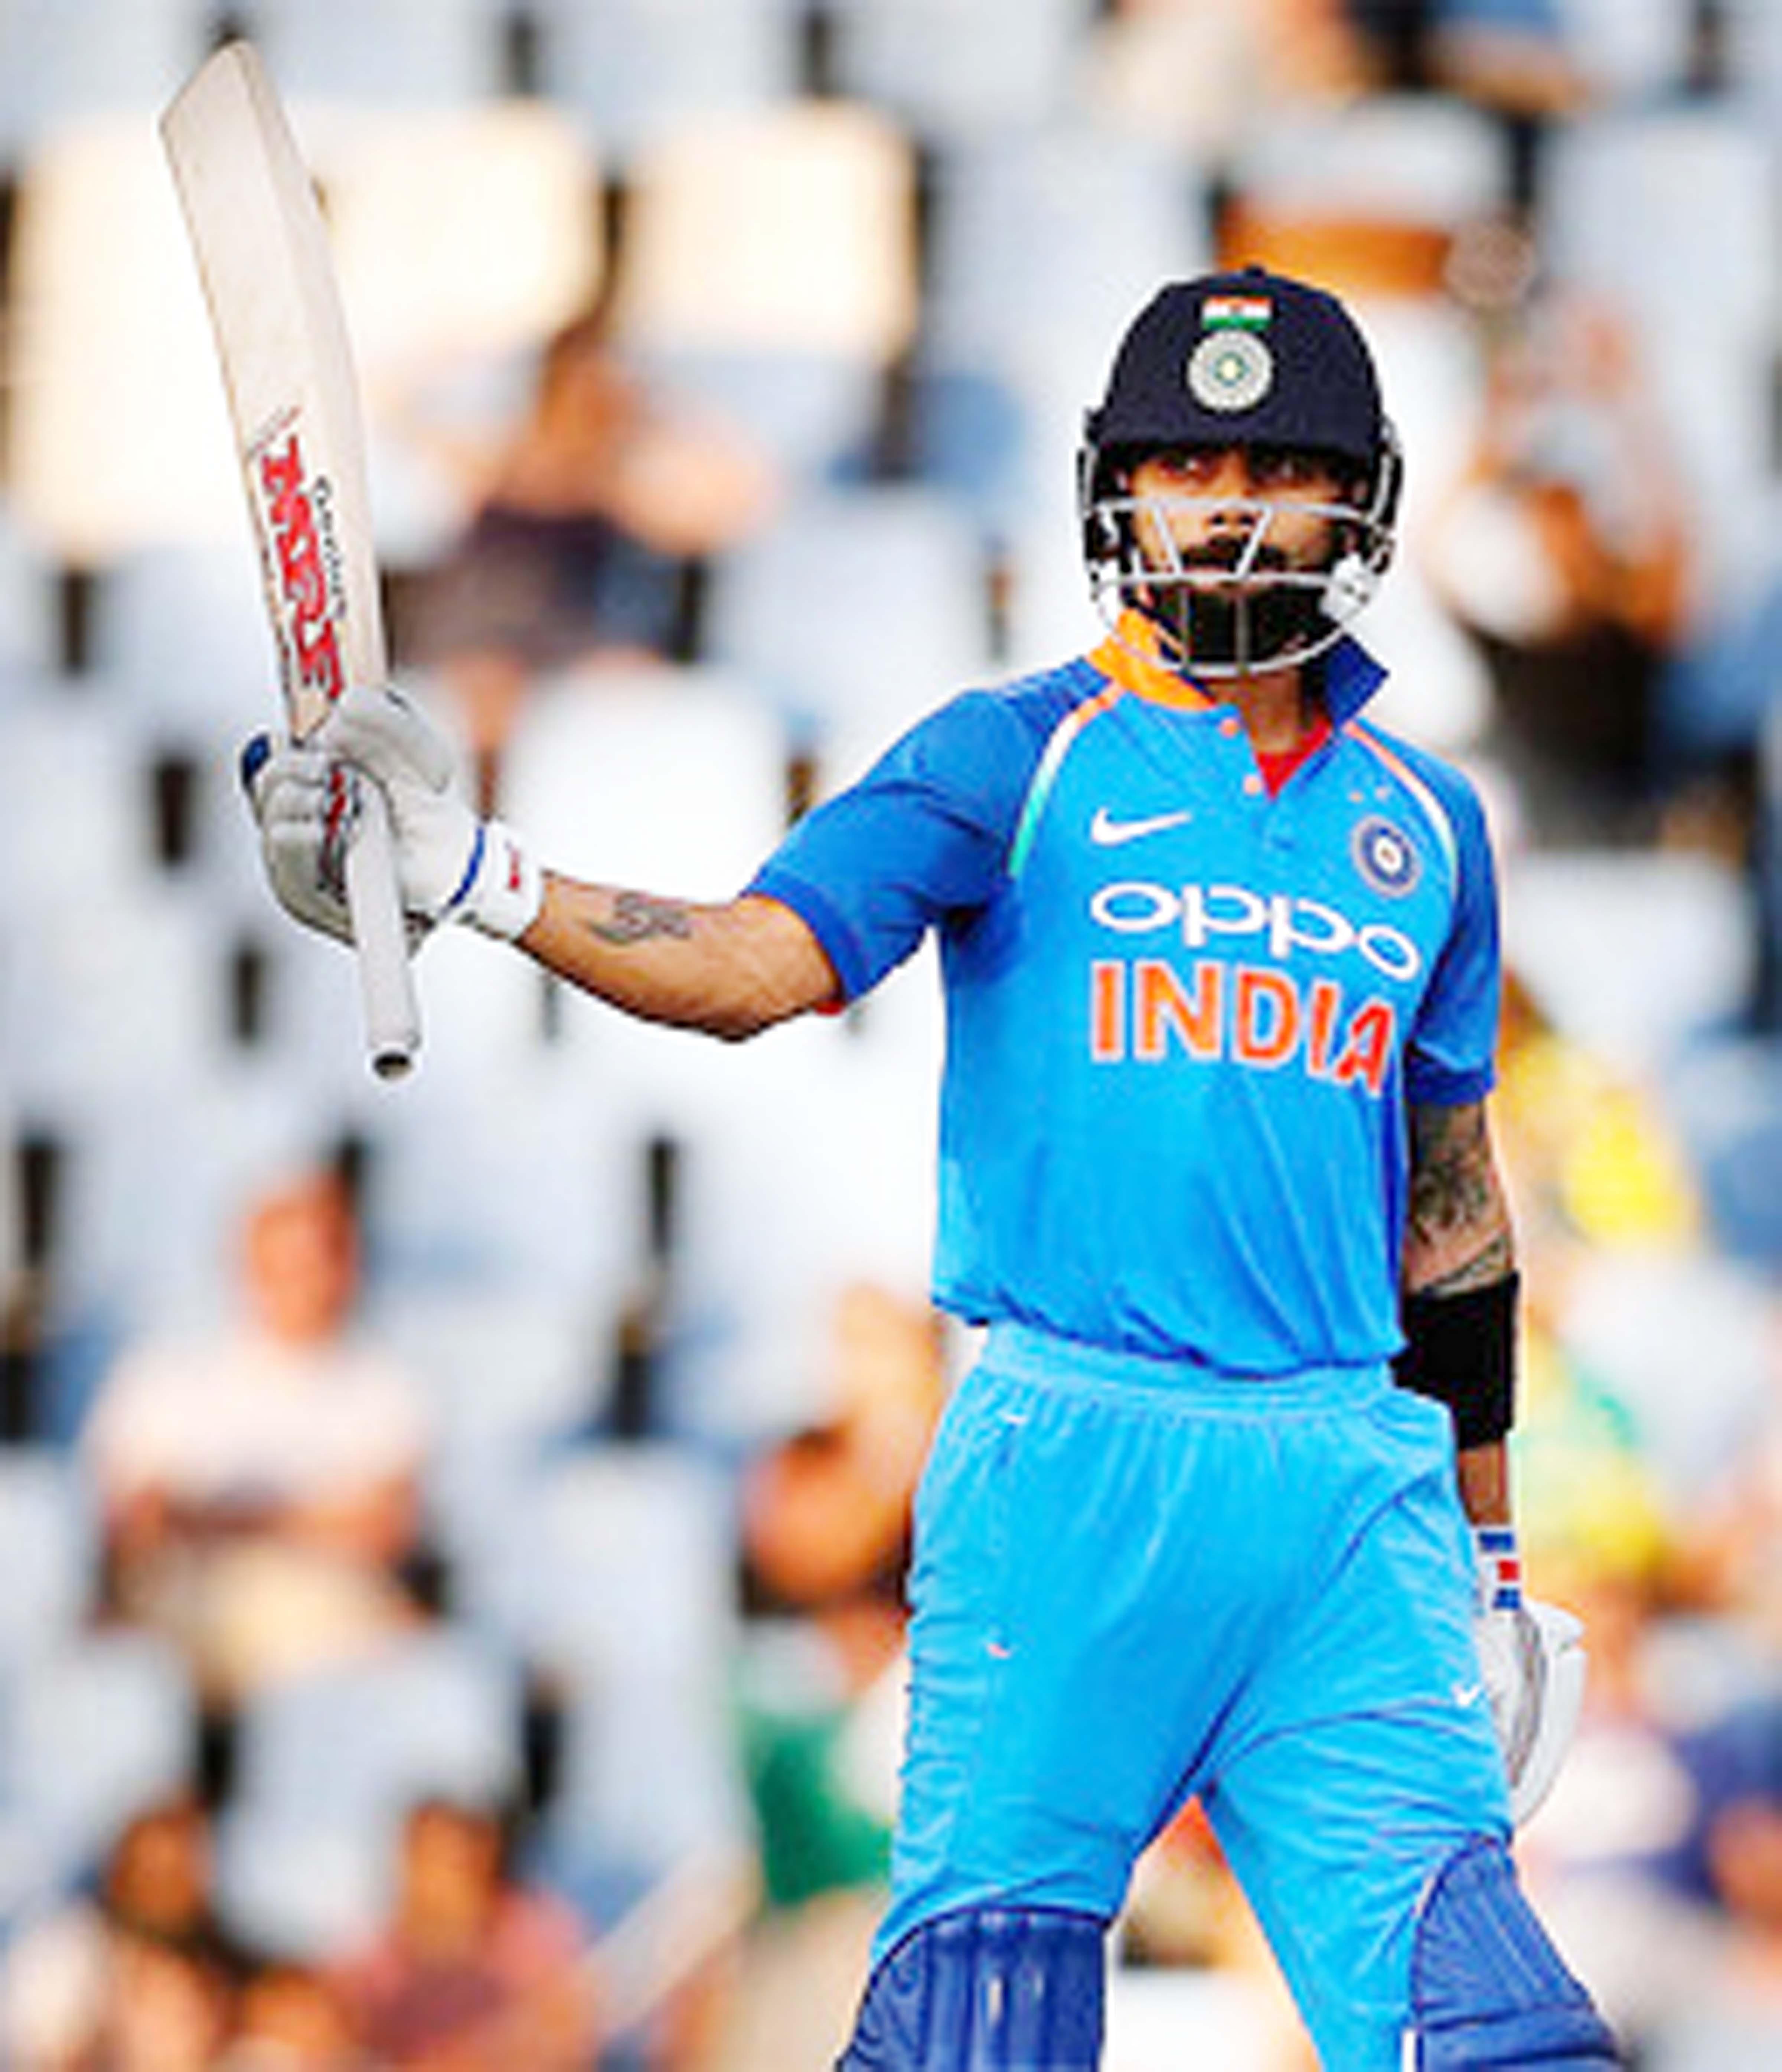 Virat Kohli celebrating 35th ODI century against South Africa in Centurion on Friday.